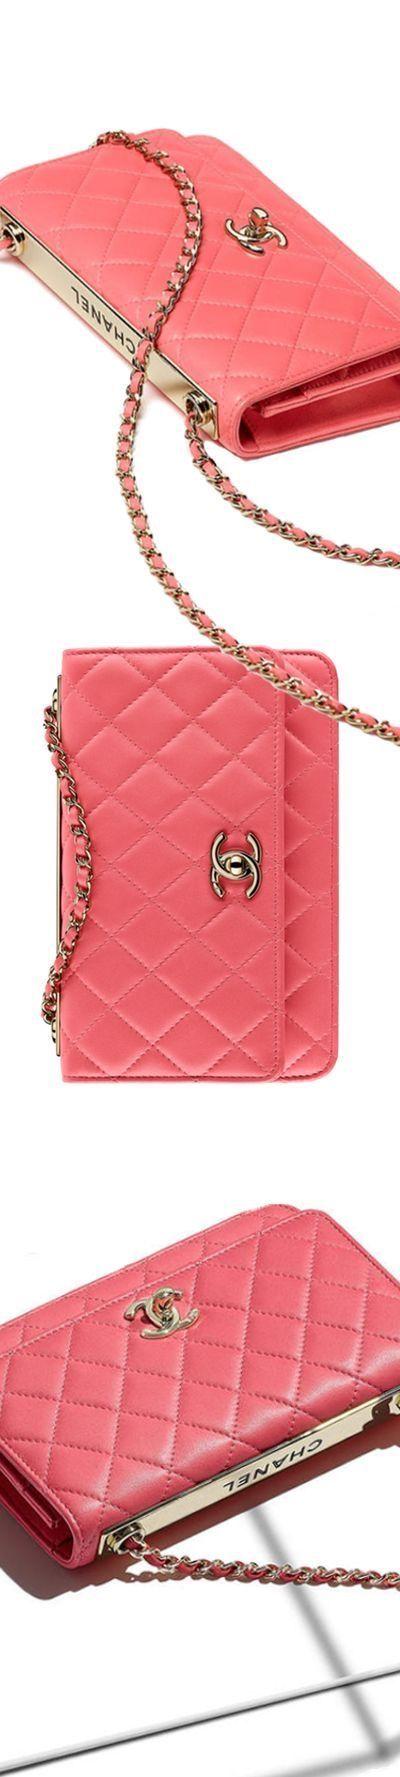 Women's Handbags & Bags : Chanel Handbags Collection & More Luxury Details… – Lucie Borowczaková